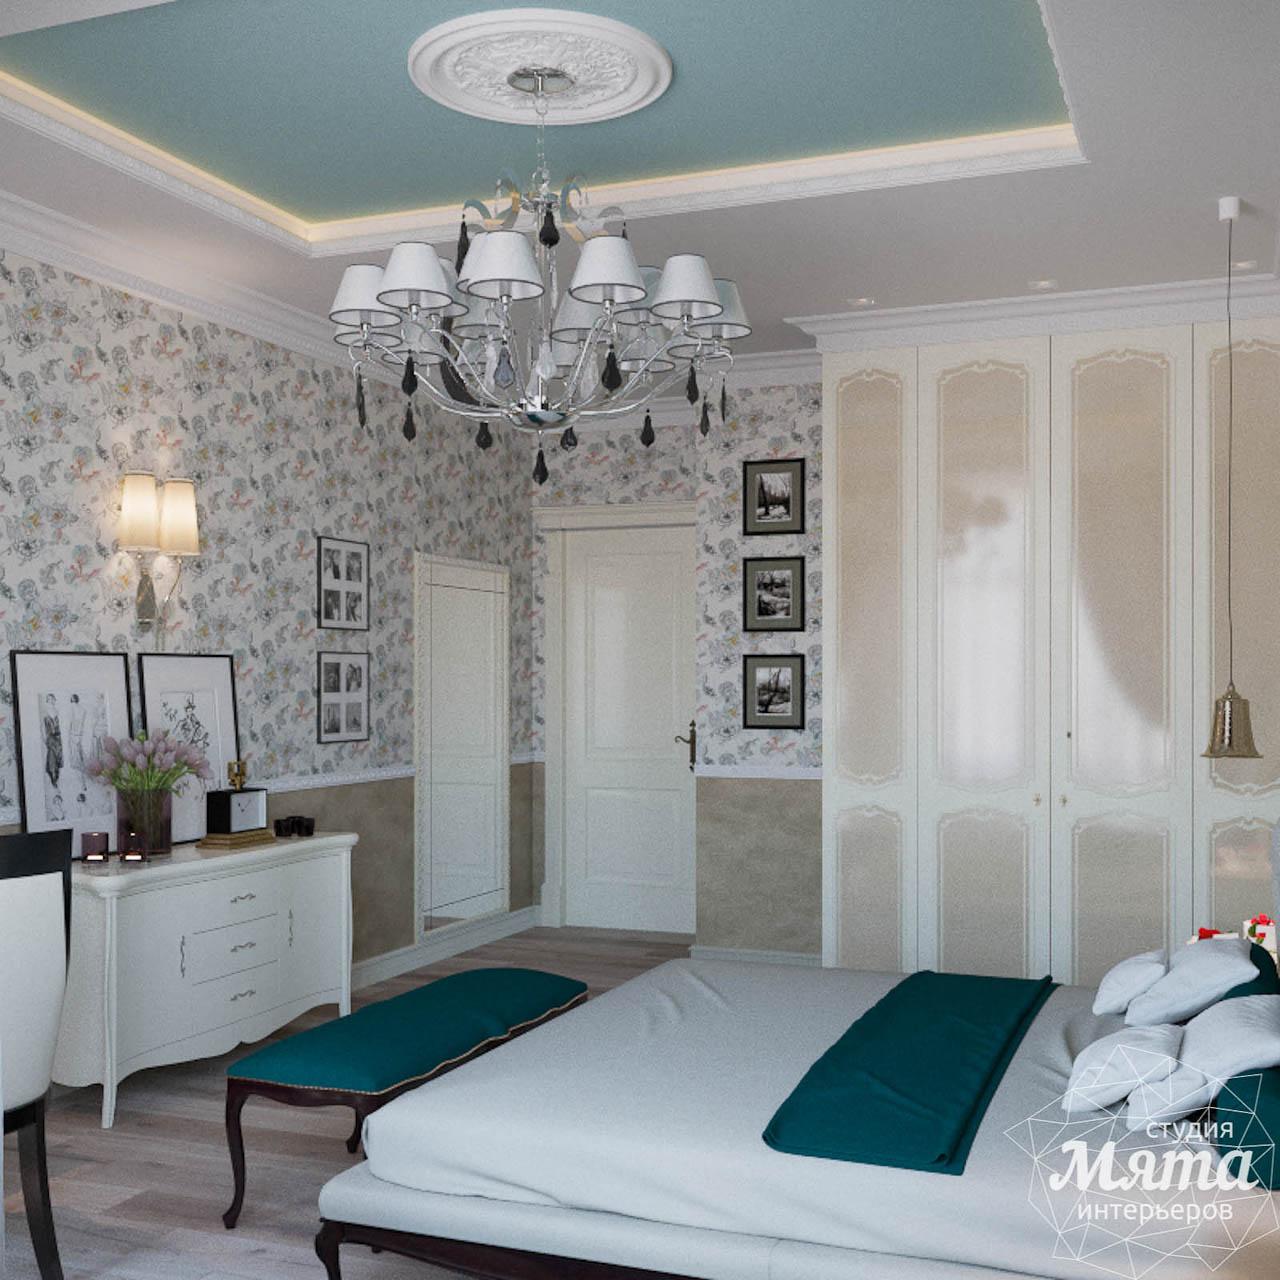 Дизайн интерьера и ремонт трехкомнатной квартиры в Карасьозерском 2 img1491597242